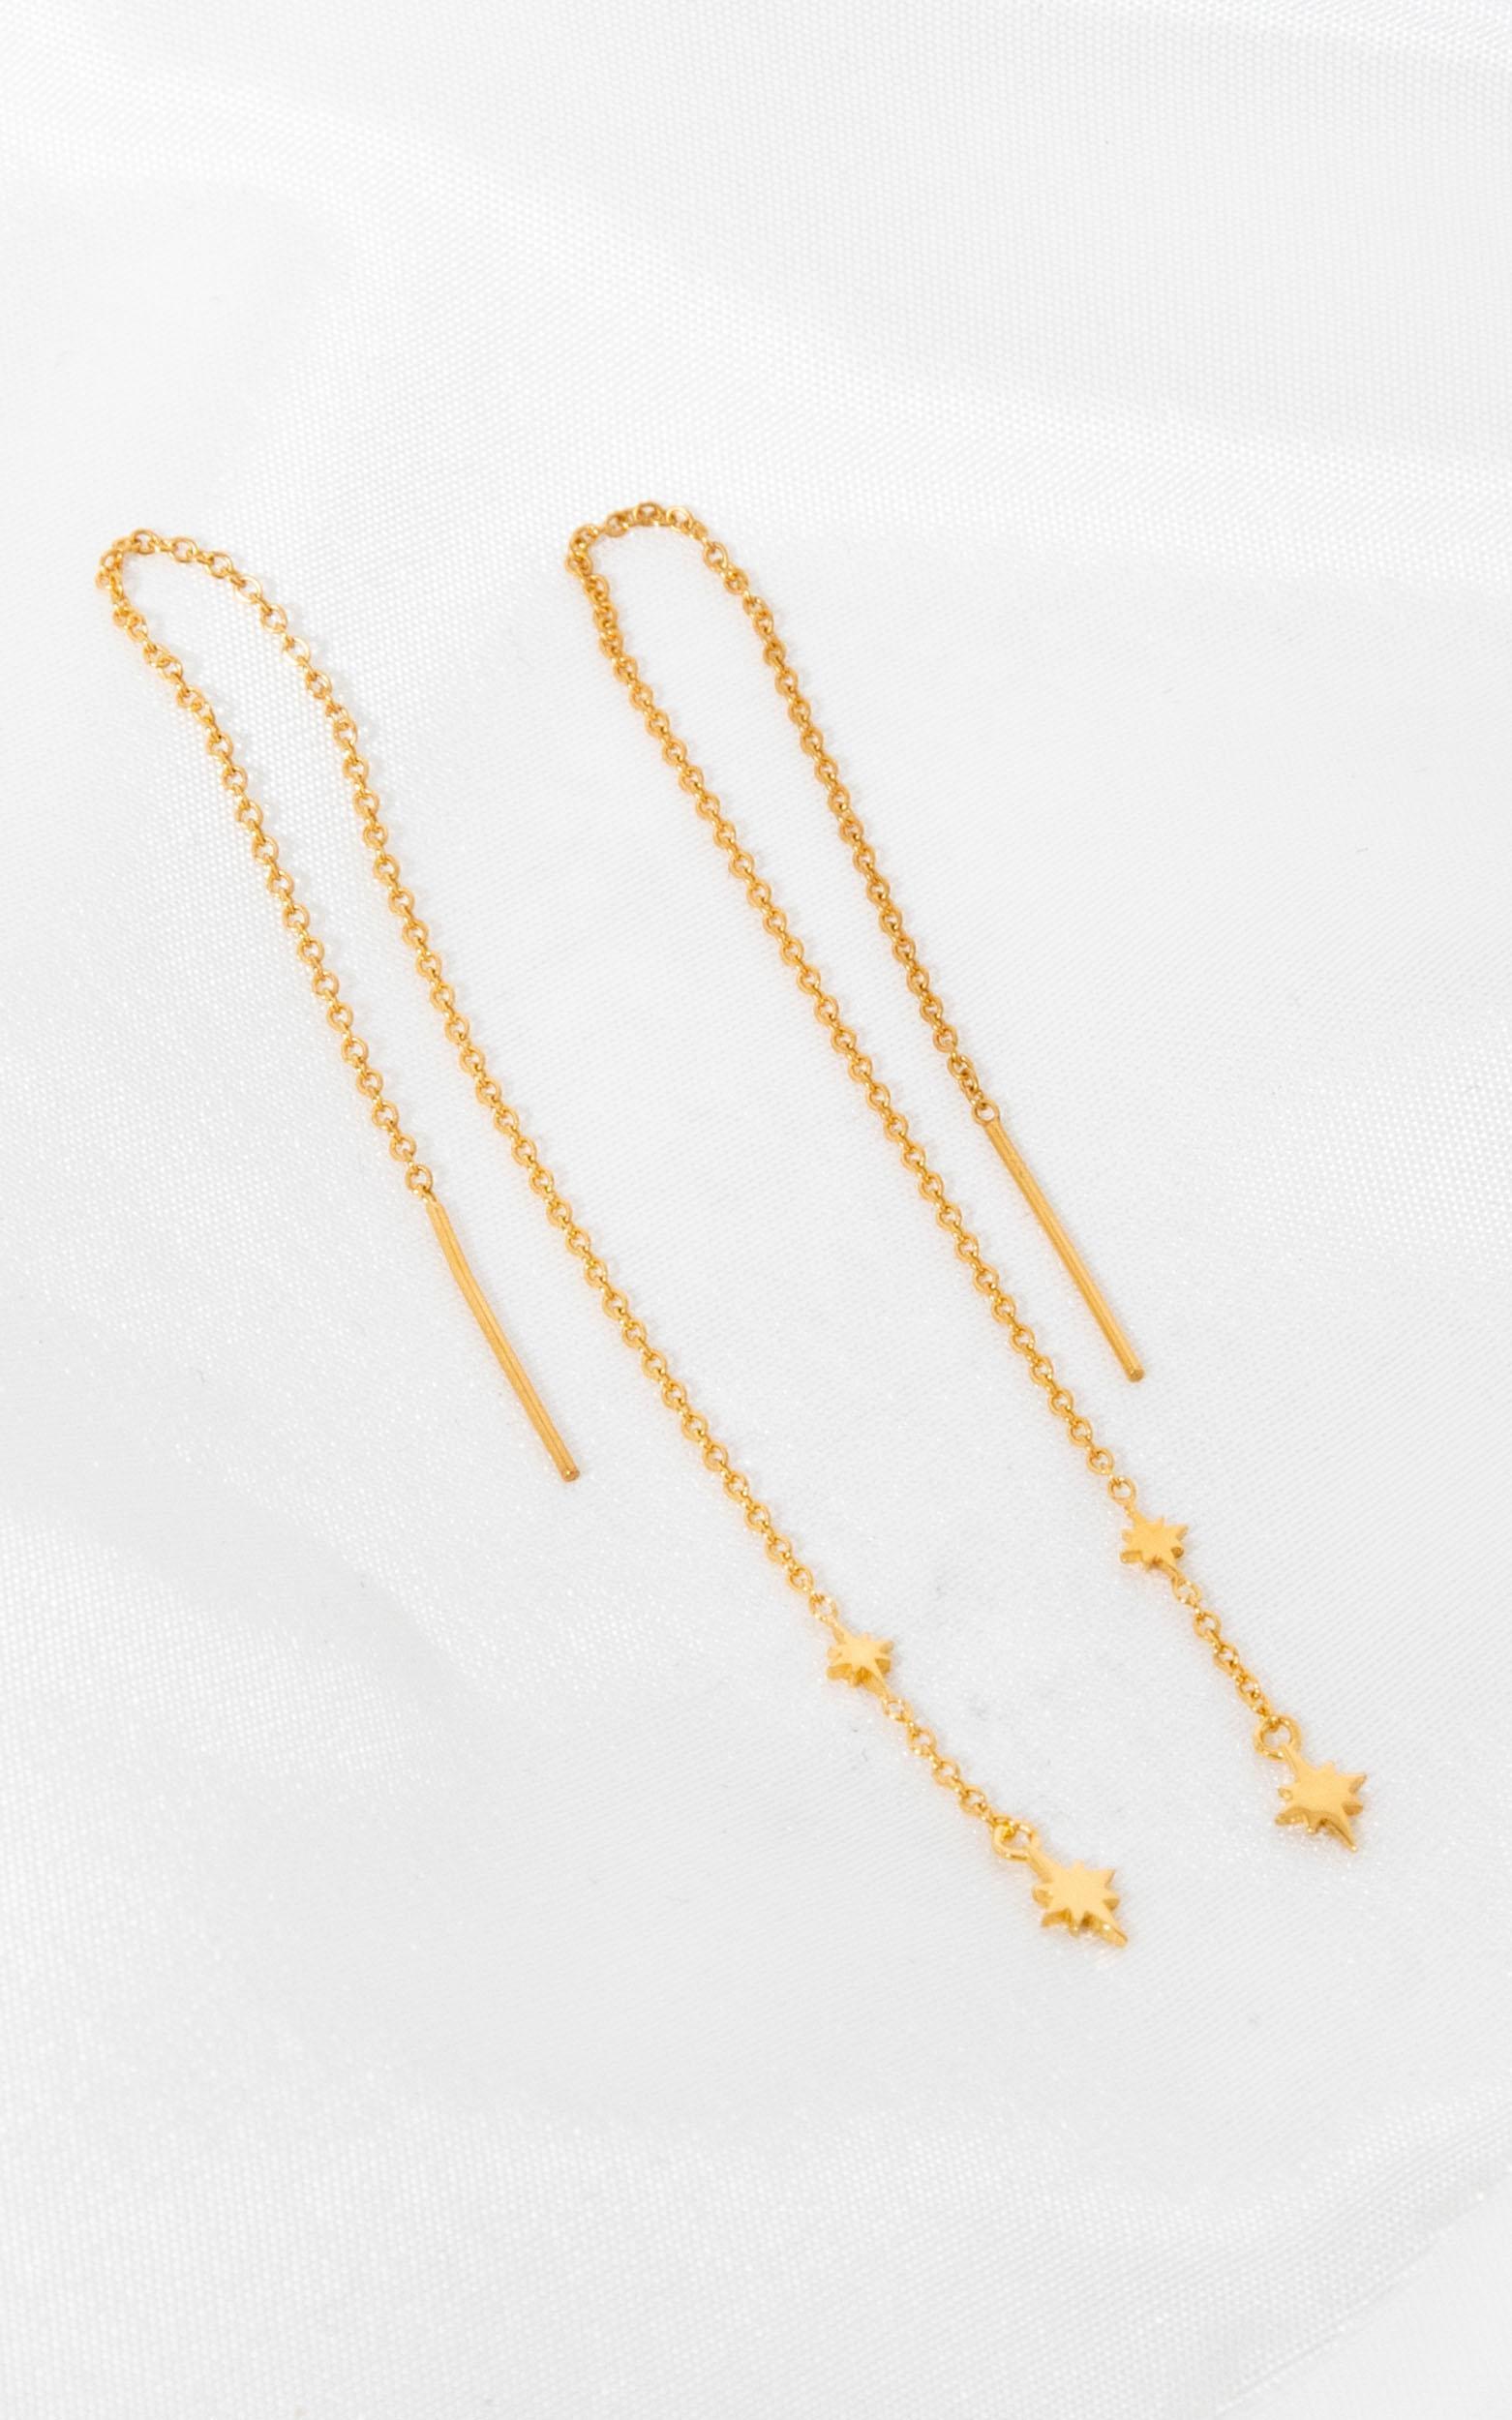 Midsummer Star - Celestial Threader Earrings In Gold, Gold, hi-res image number null